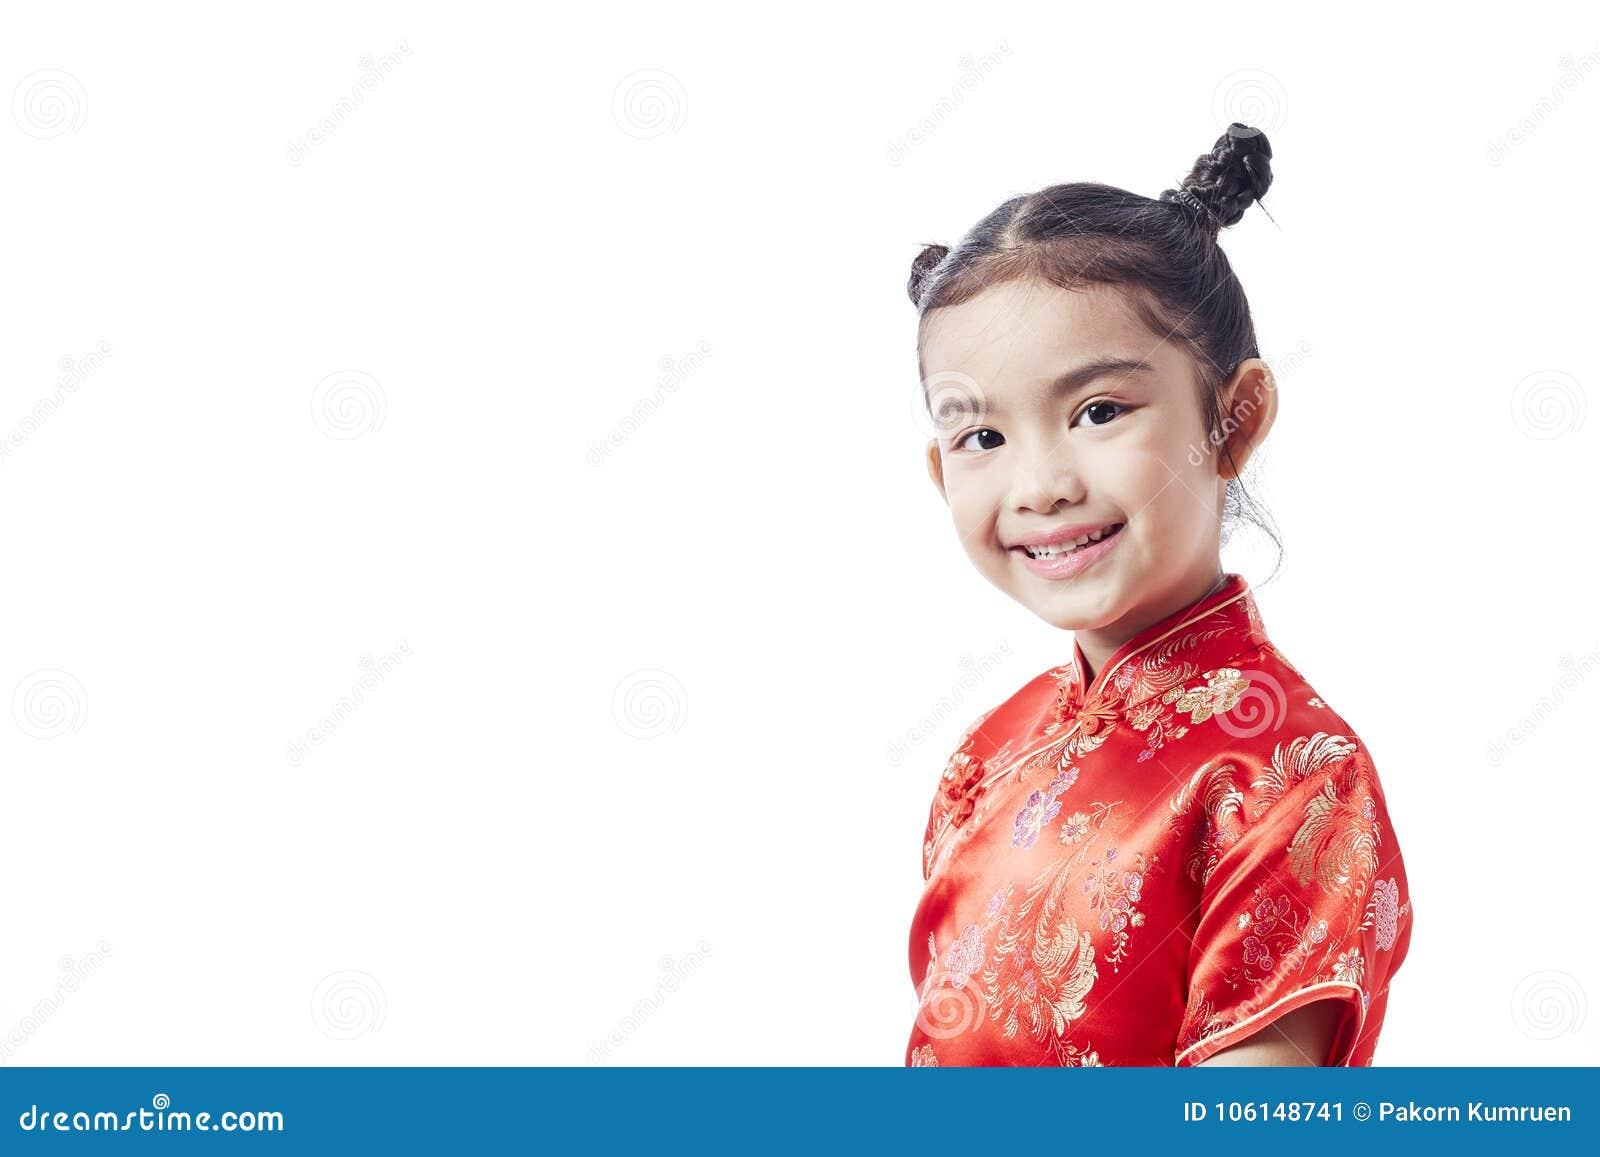 dddfe28e7b09 Little Asian Child , Chinese New Year Stock Image - Image of china ...